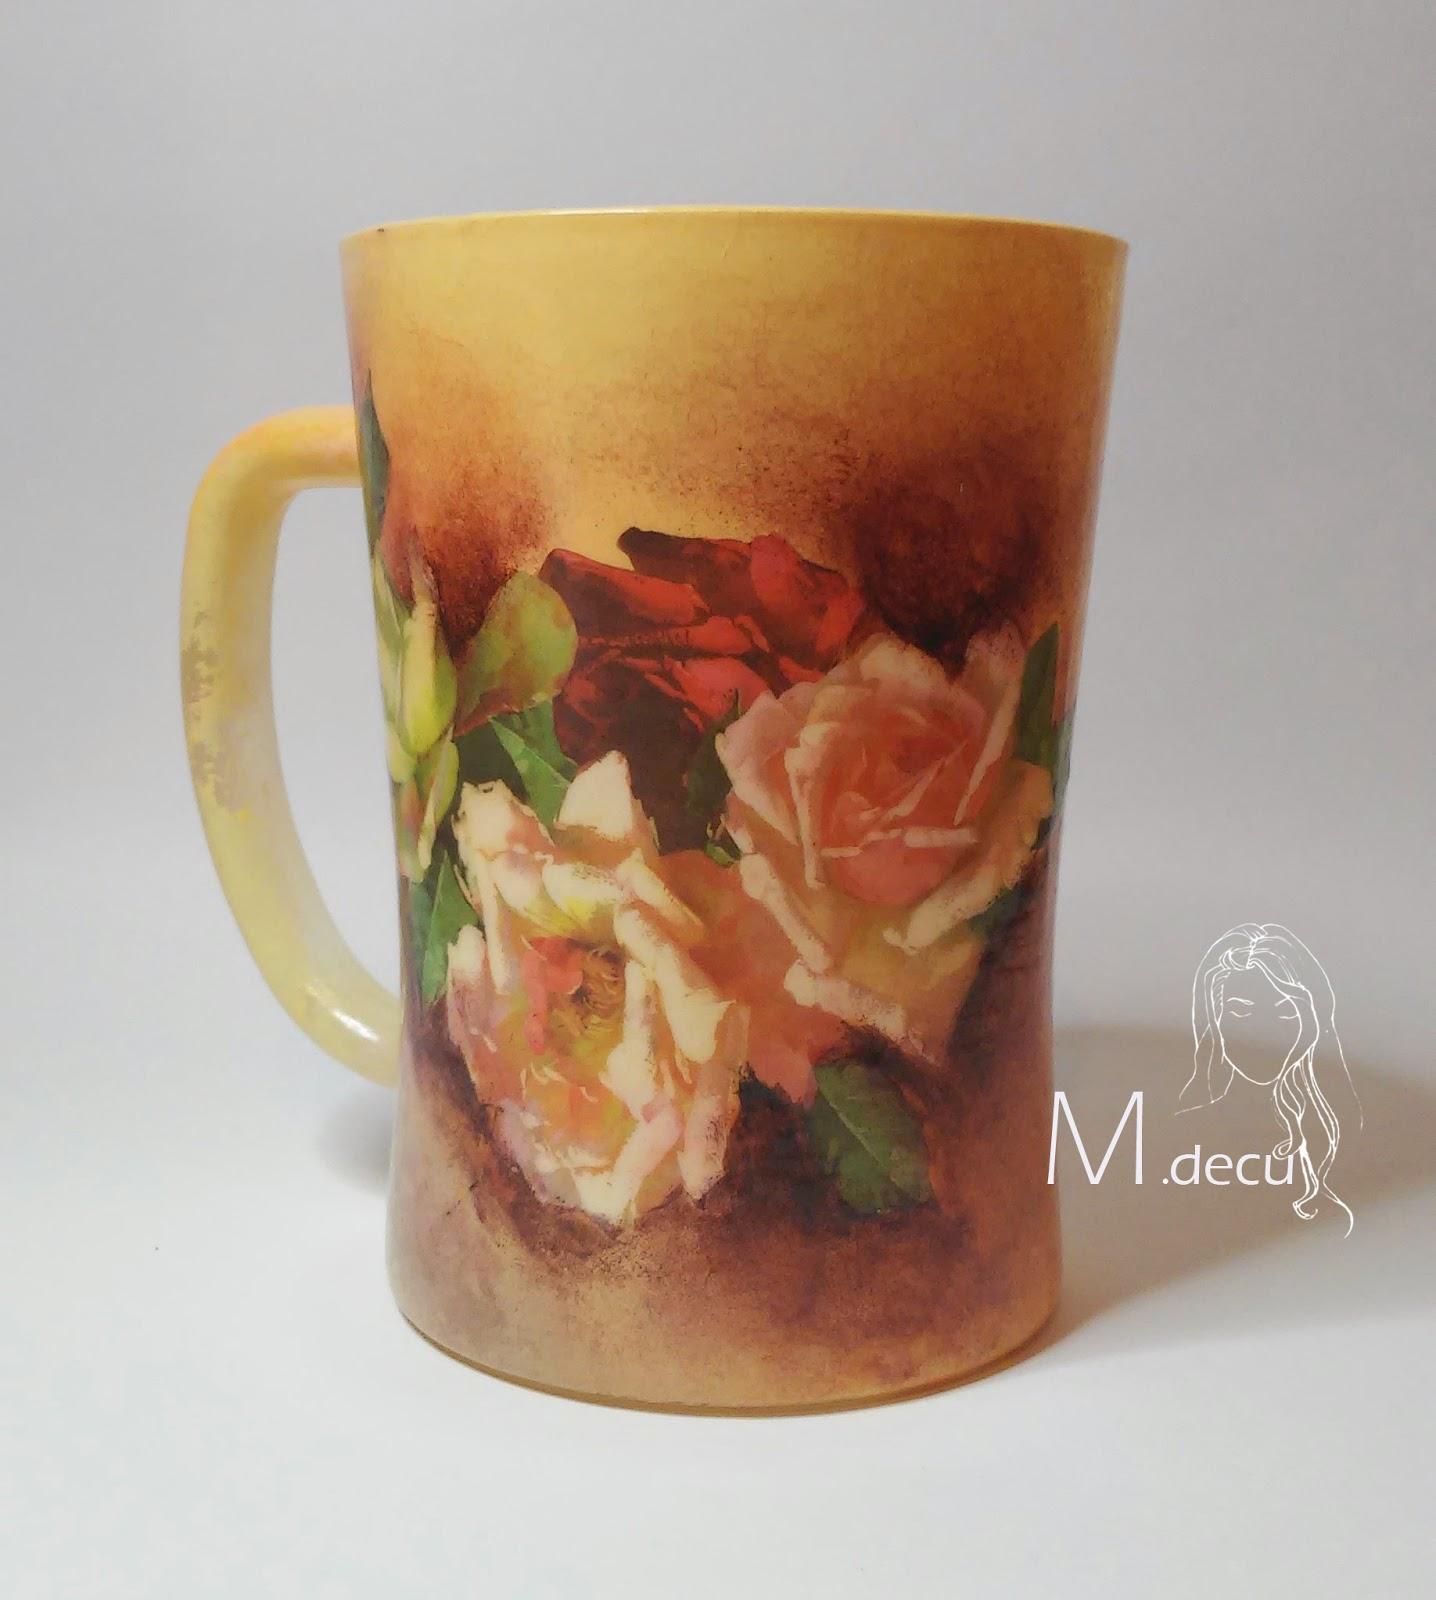 http://mdecu.blogspot.com/2014/12/eksperymentalny-kufel-experimental-mug.html